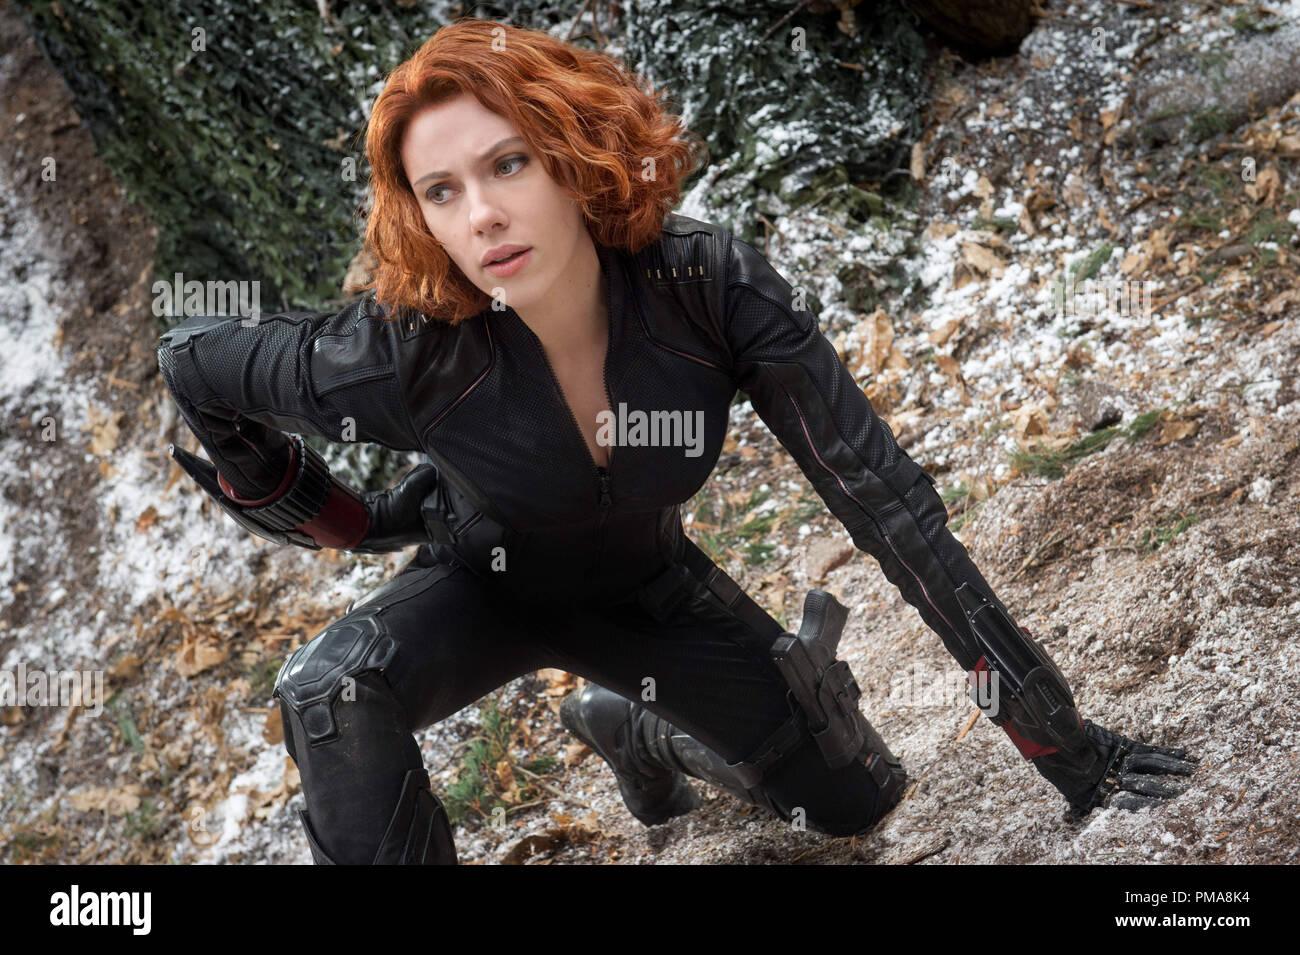 Scarlett Johansson Avengers Black Widow Stock Photos